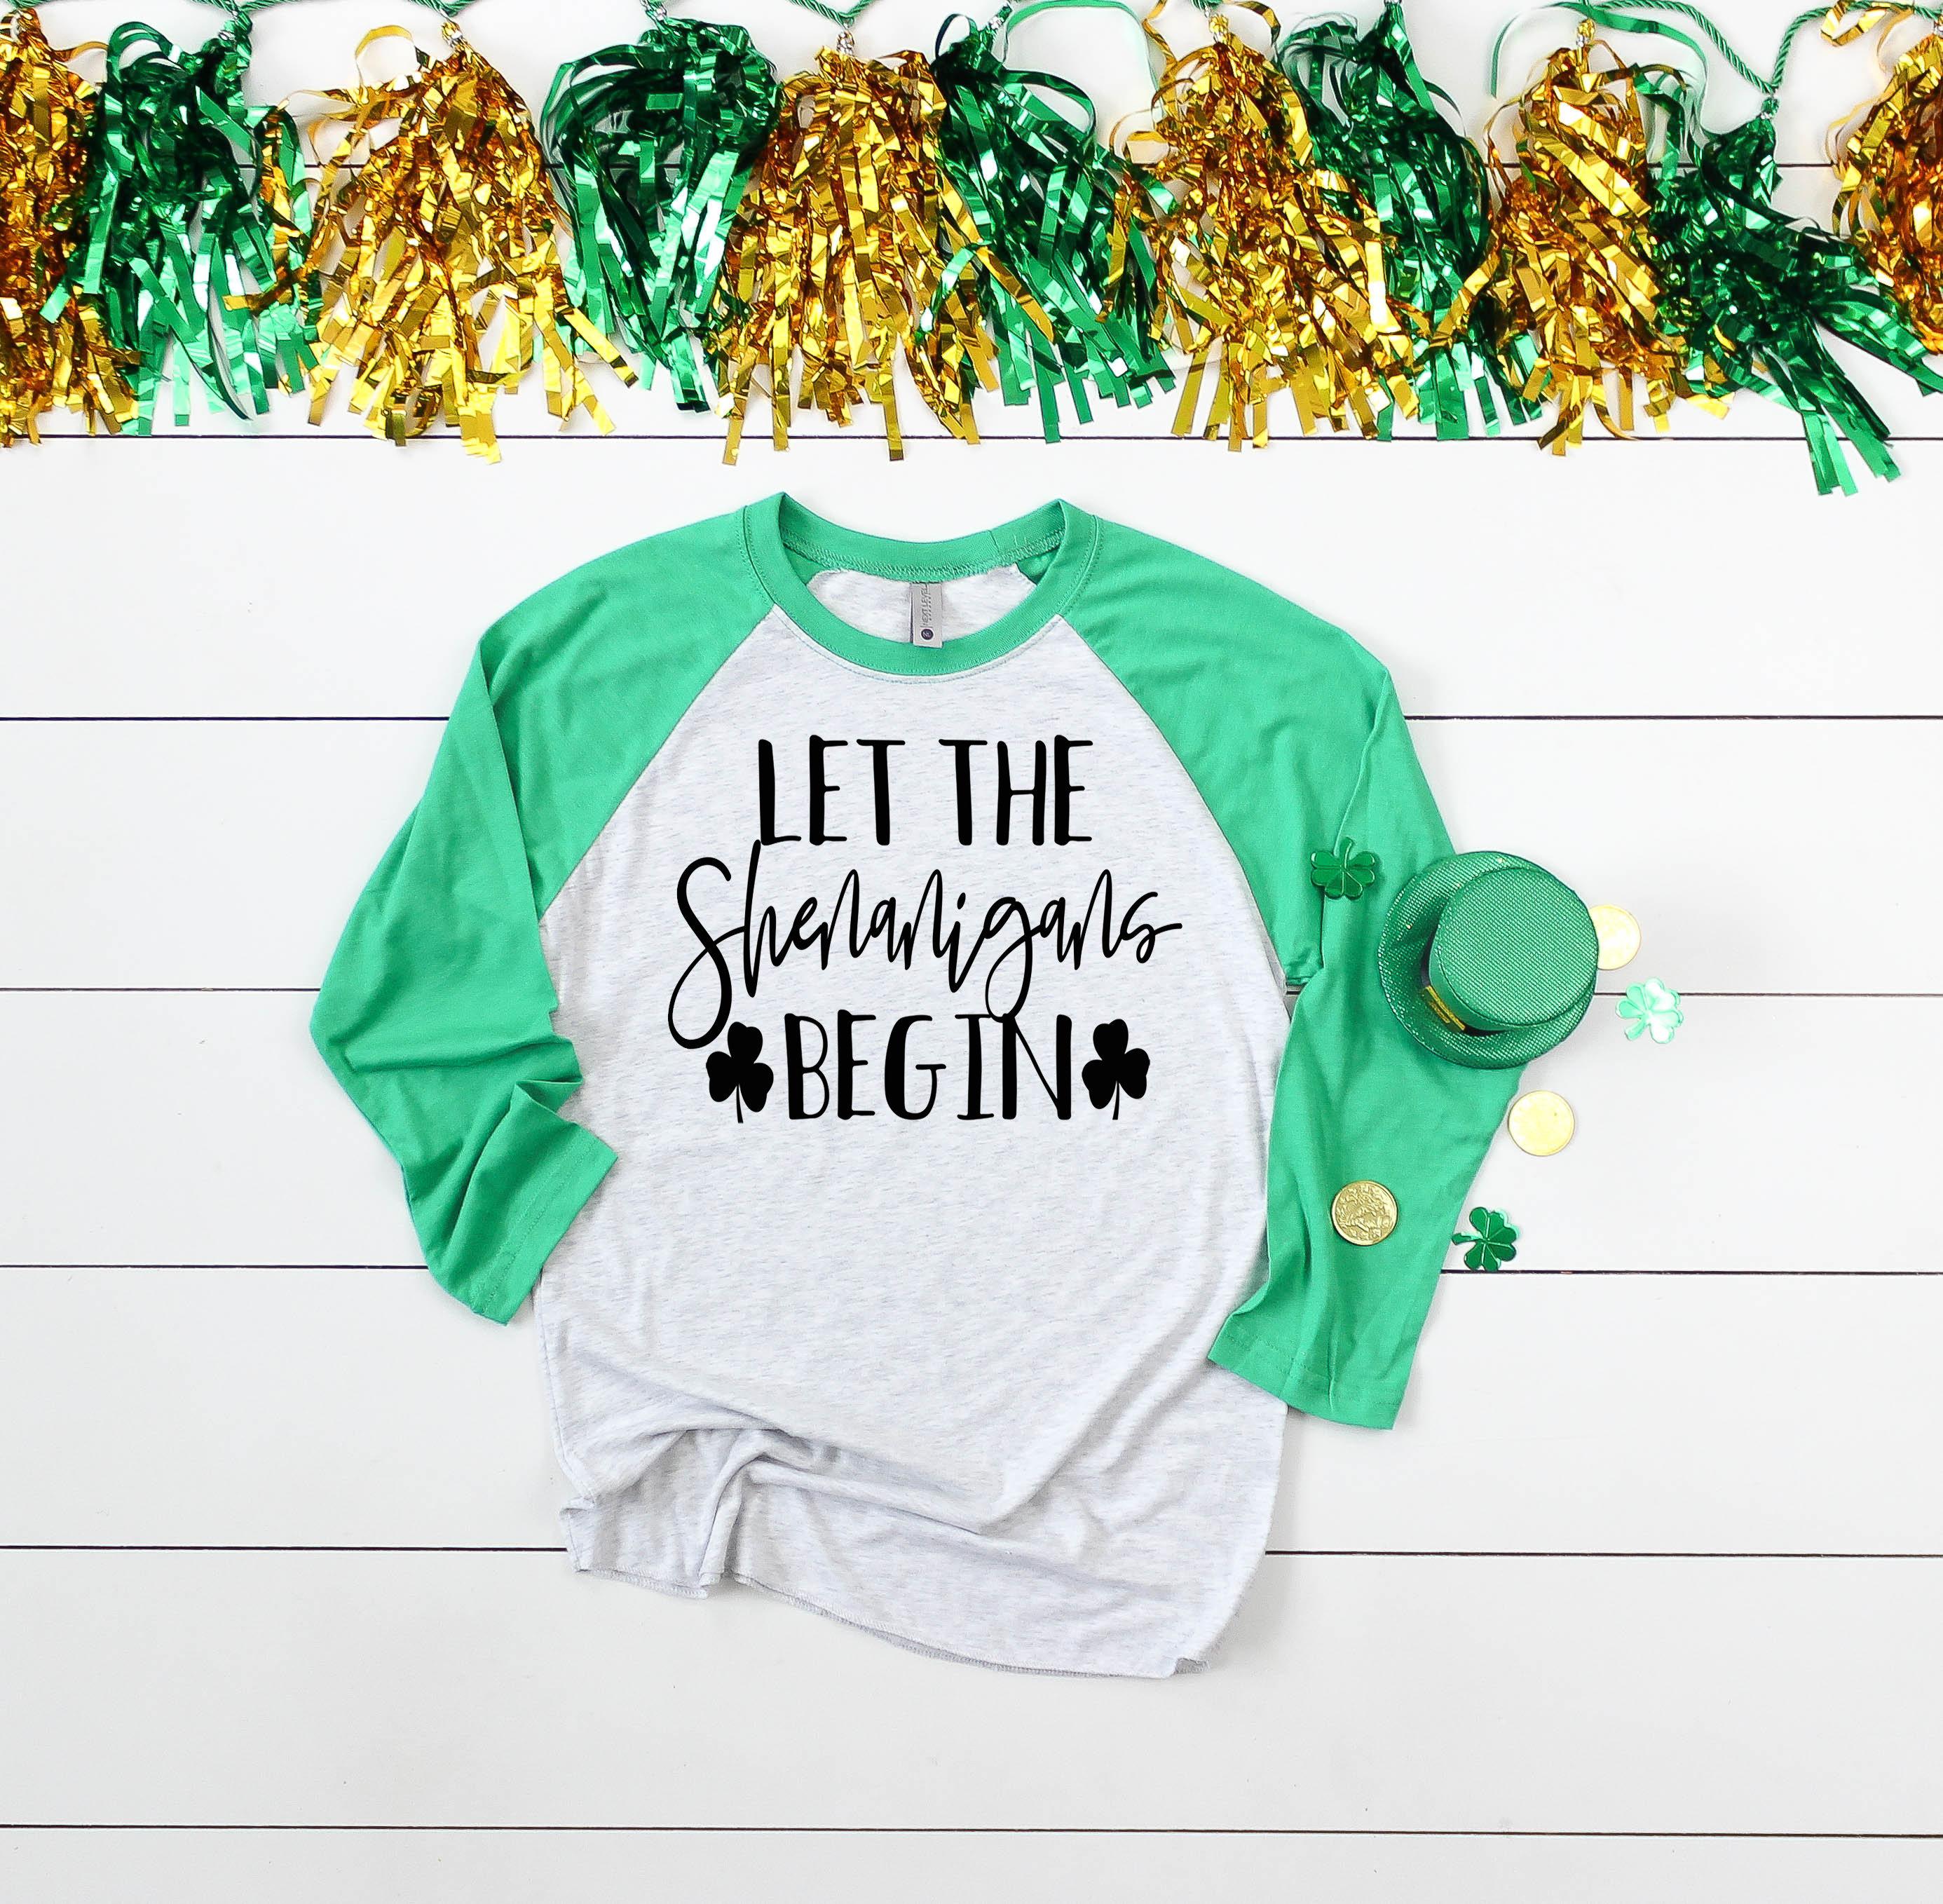 50d725b68 Let the Shenanigans Begin St. Patrick's Raglan Shirt - St Paddy's Day ...